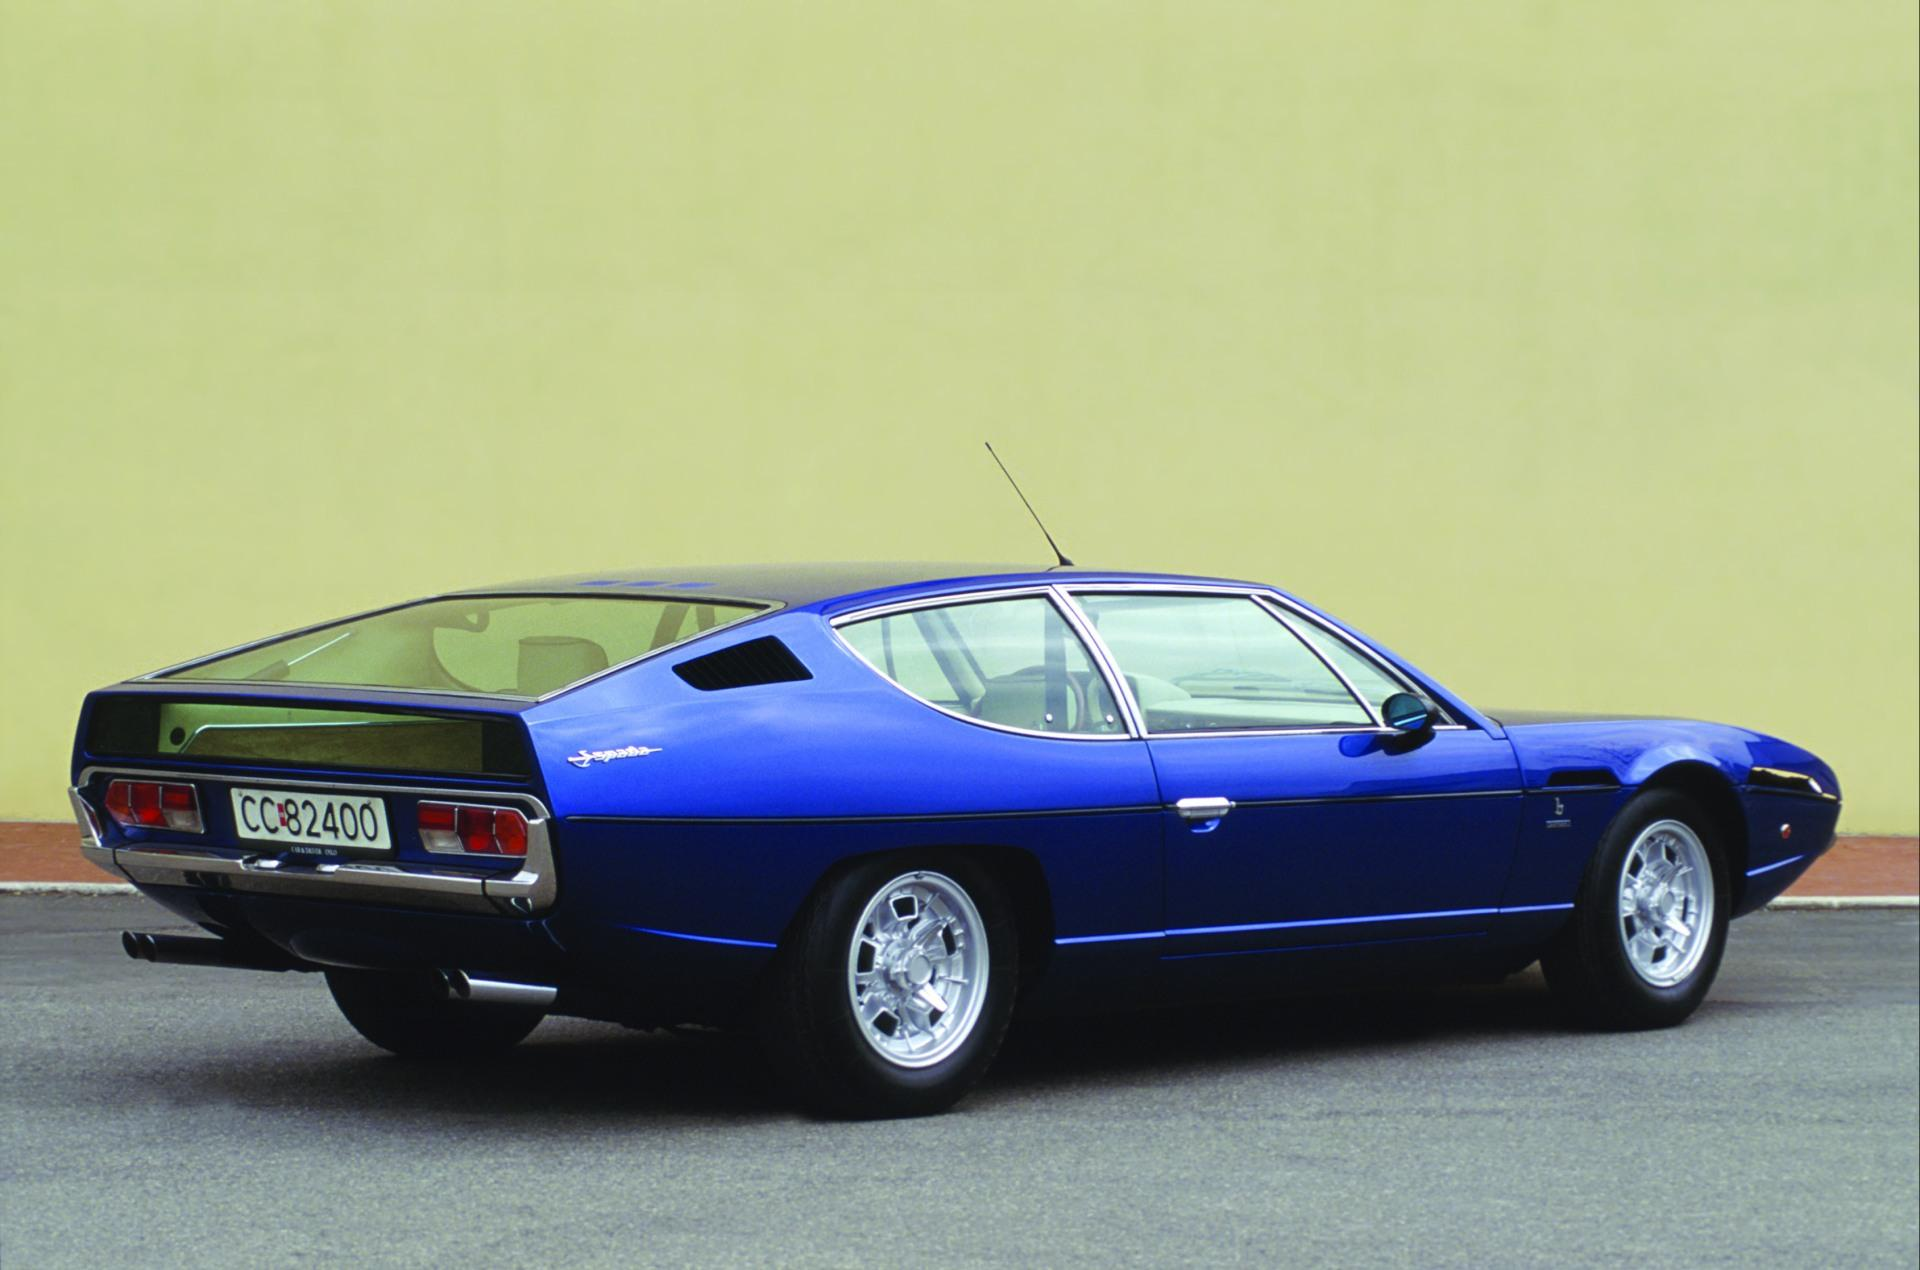 https://www.conceptcarz.com/images/Lamborghini/1968-Lamborghini-Espada-Coupe-Image-06.jpg